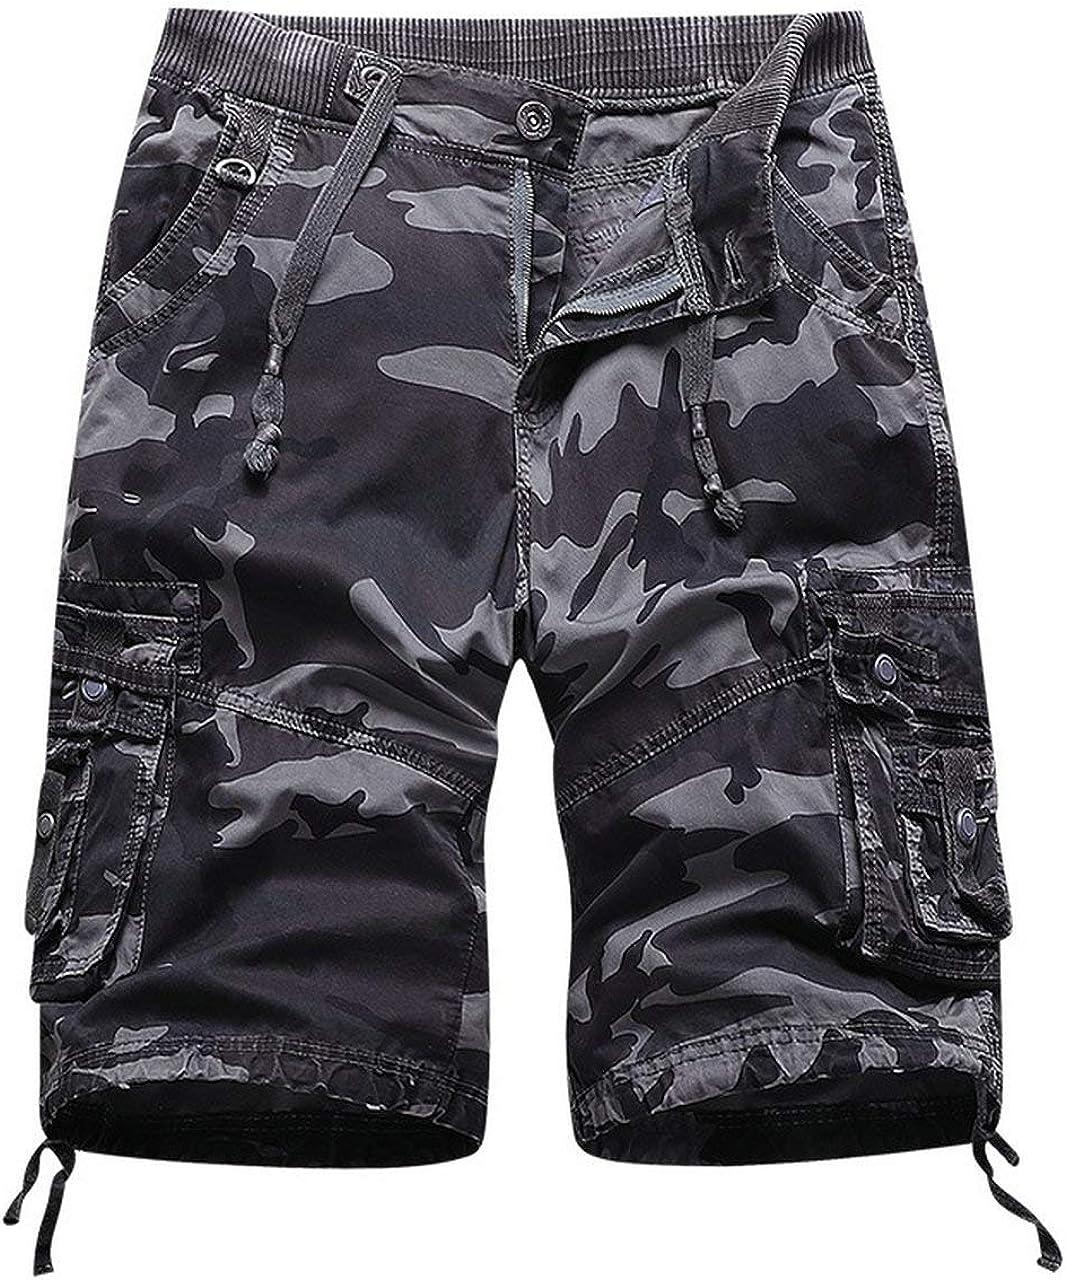 Raroauf Men's Cargo Shorts Elastic Waist Drawstring, Relaxed Fit Multi-Pocket Outdoor Twill Cotton Camo Shorts